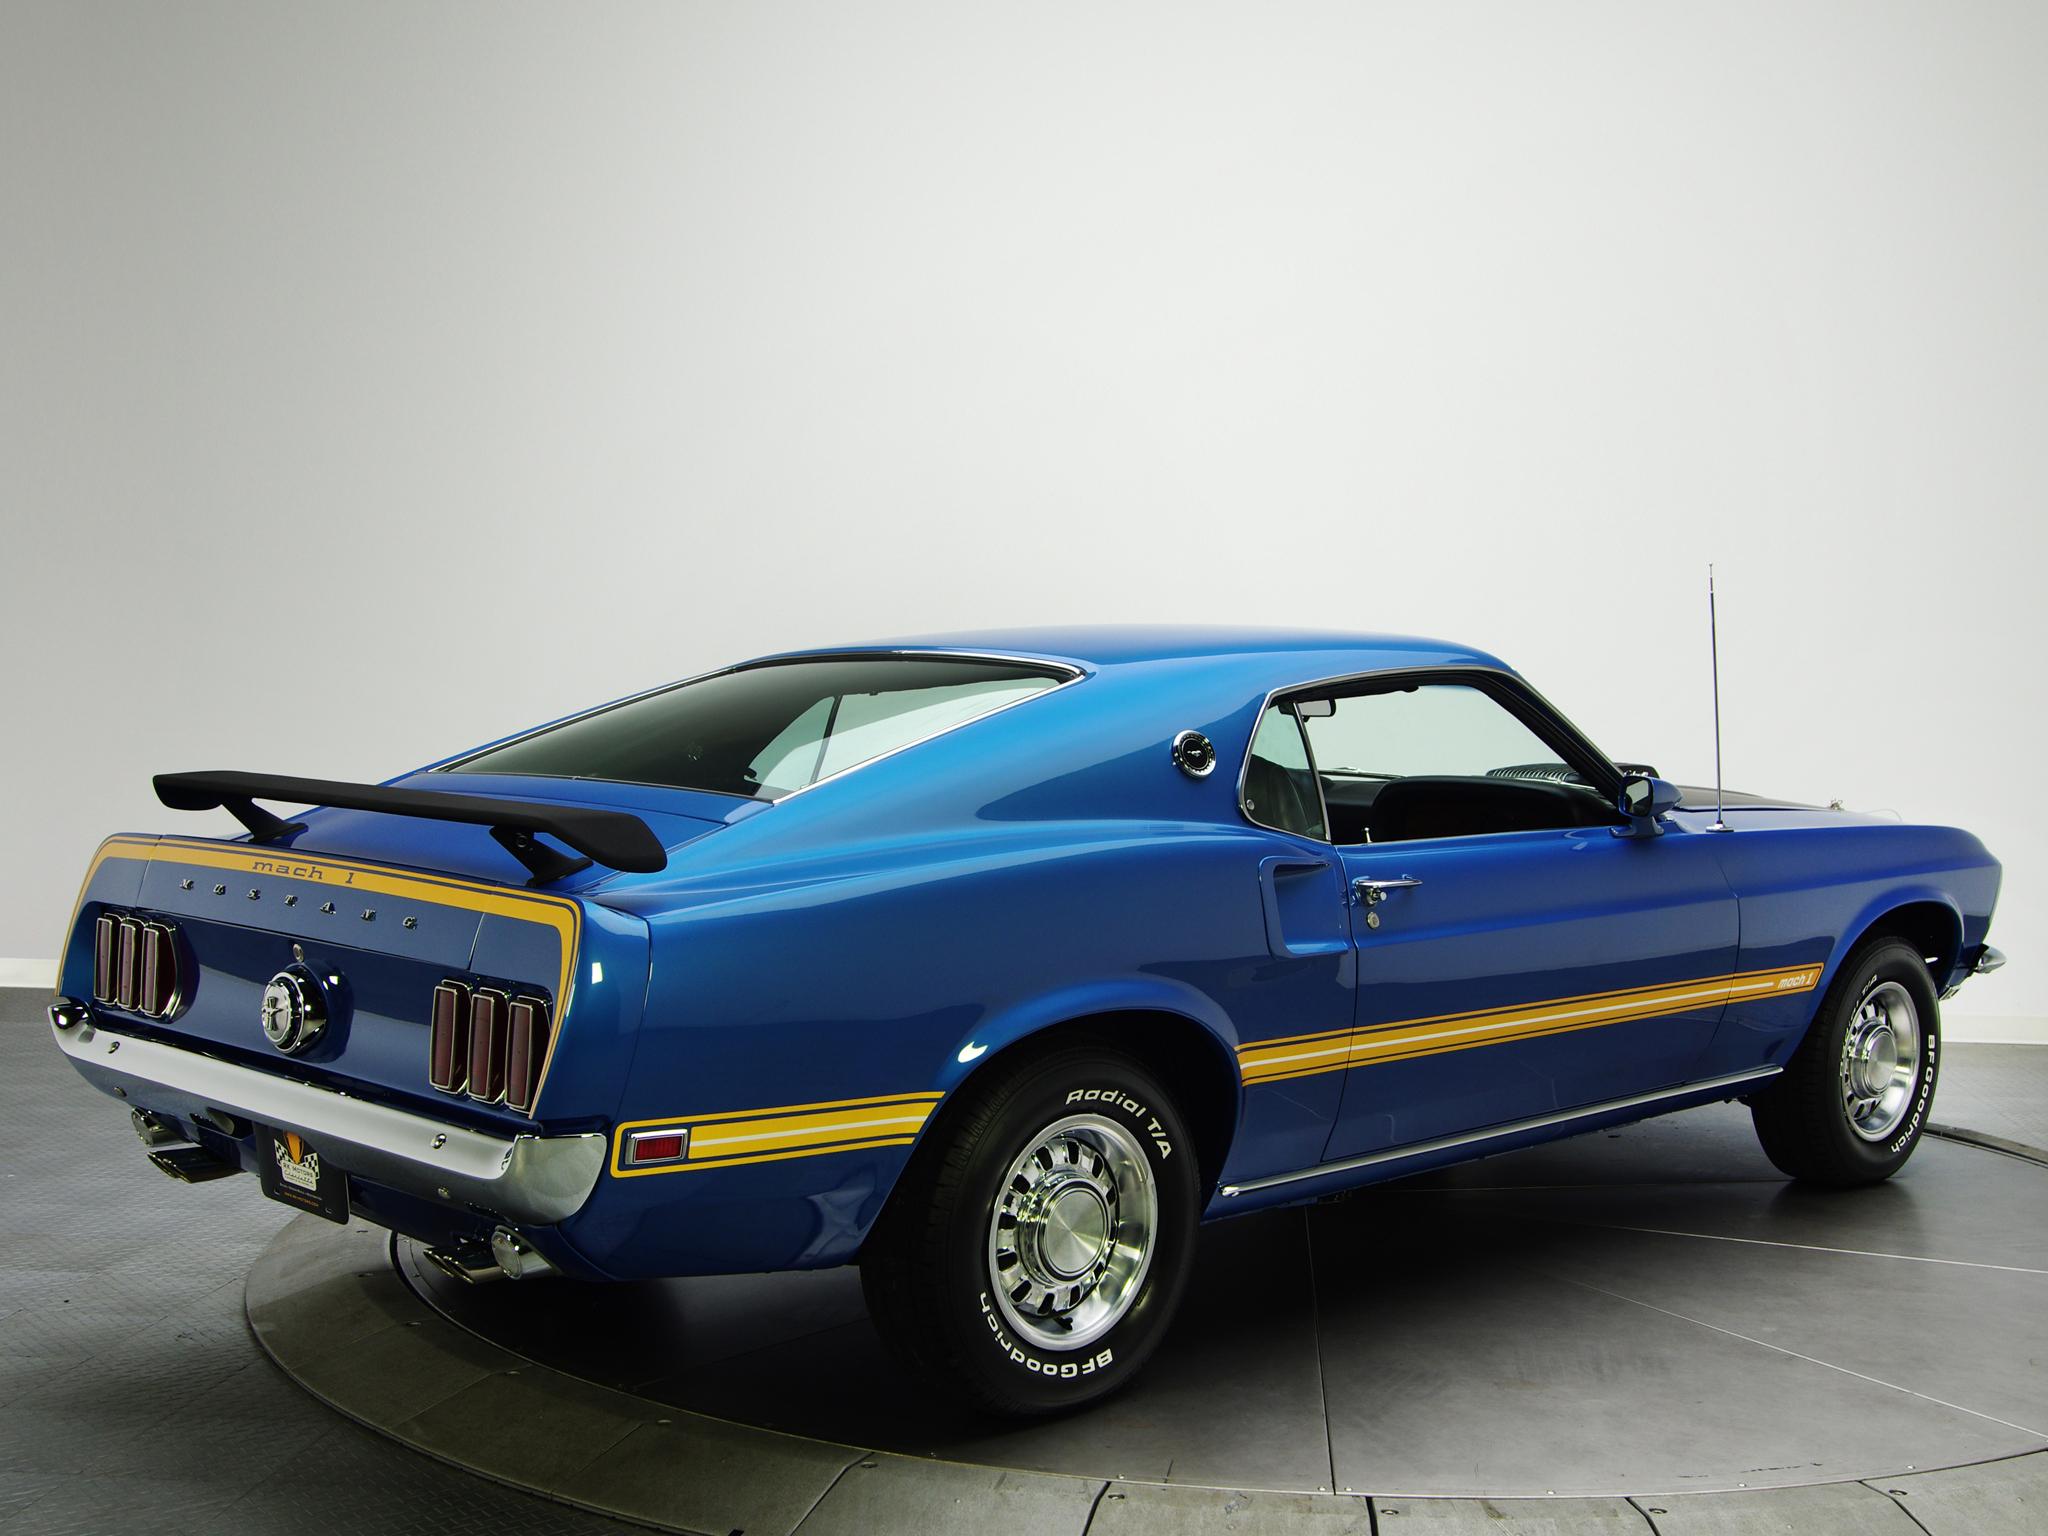 1969 Mustang Mach 1 428 Super Cobra Jet Muscle Classic G 1964 Ford Wallpaper 2048x1536 134100 Wallpaperup